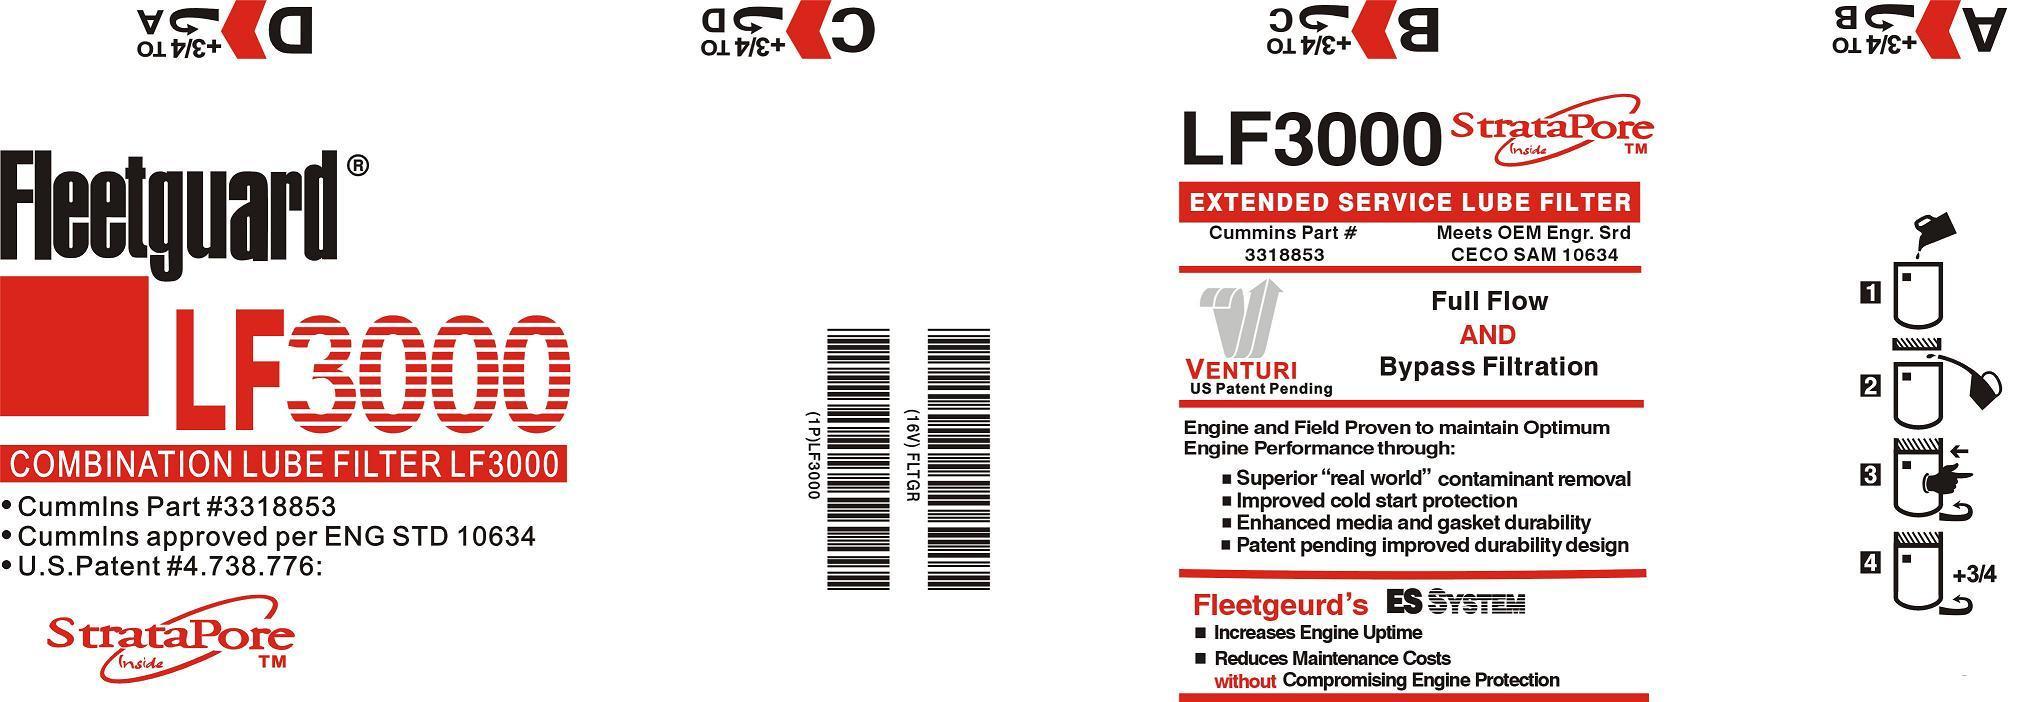 Oil Filter Lf691A Replaces Fleetguard for Cummins